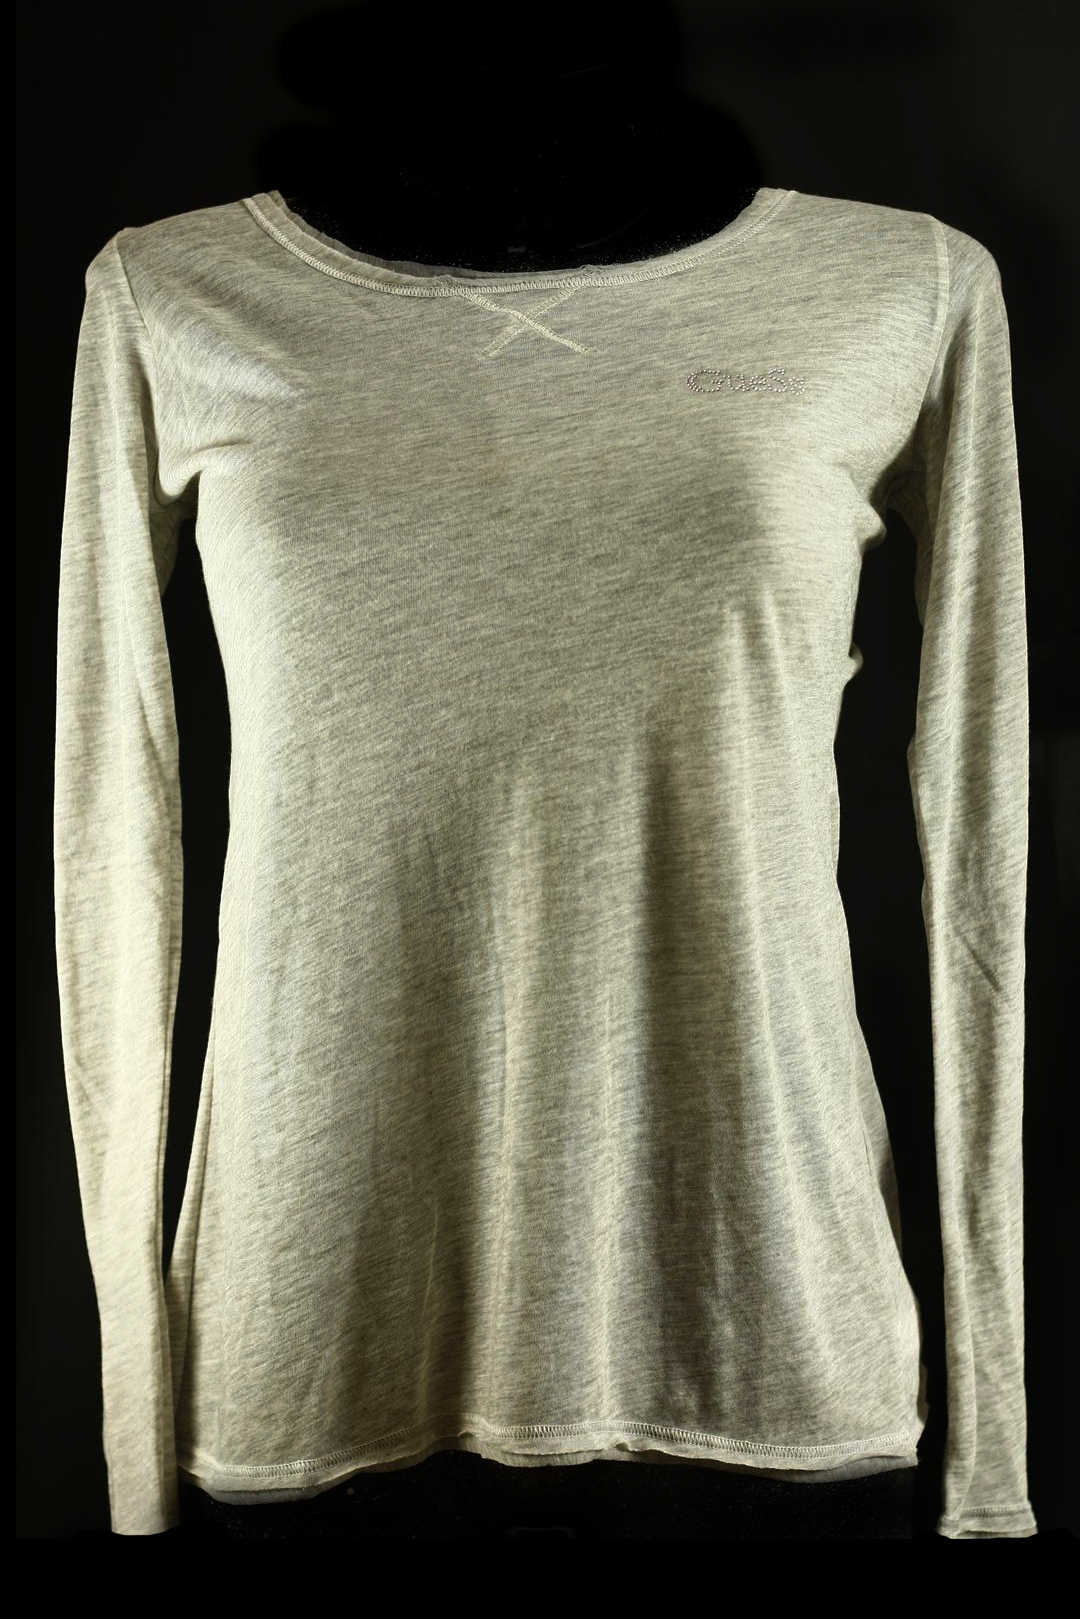 Dámské triko UC6D2B - Guess Barva: šedá, Velikost: L